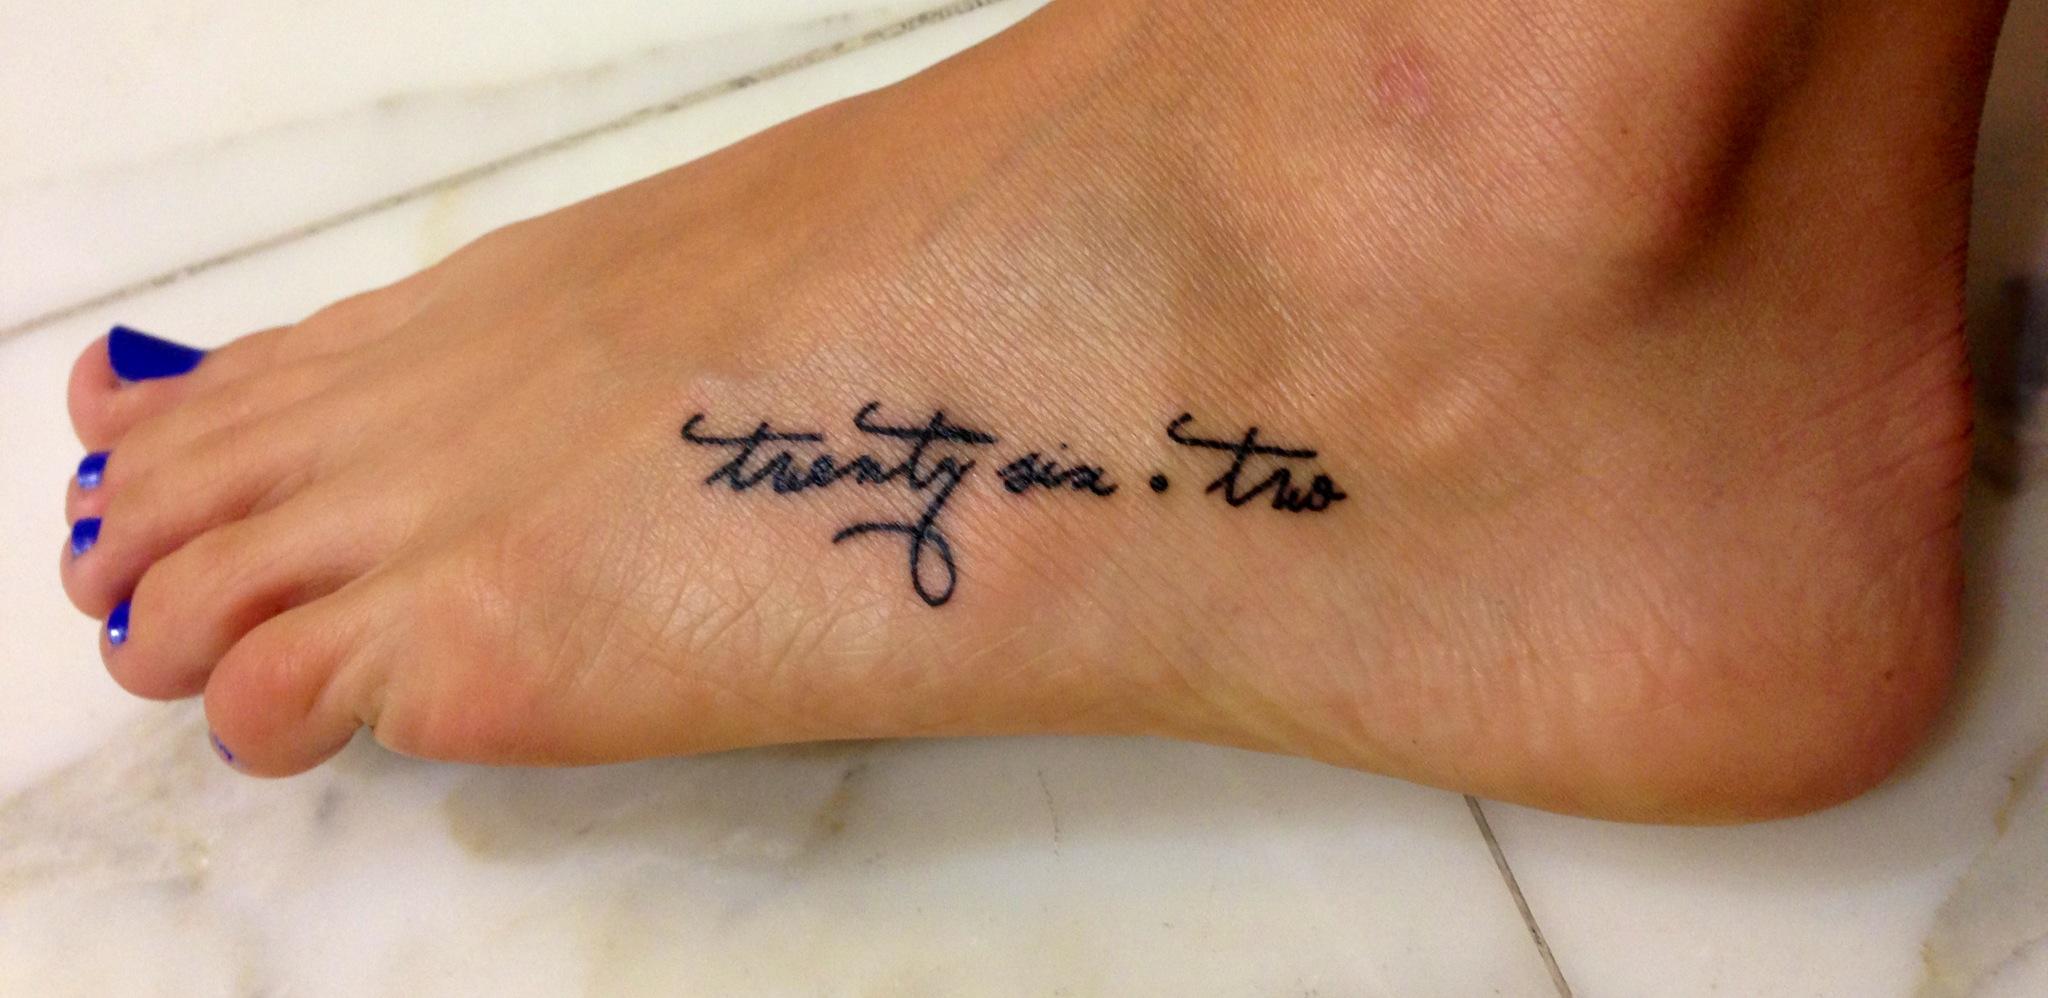 Back gt images for gt marathon running tattoos